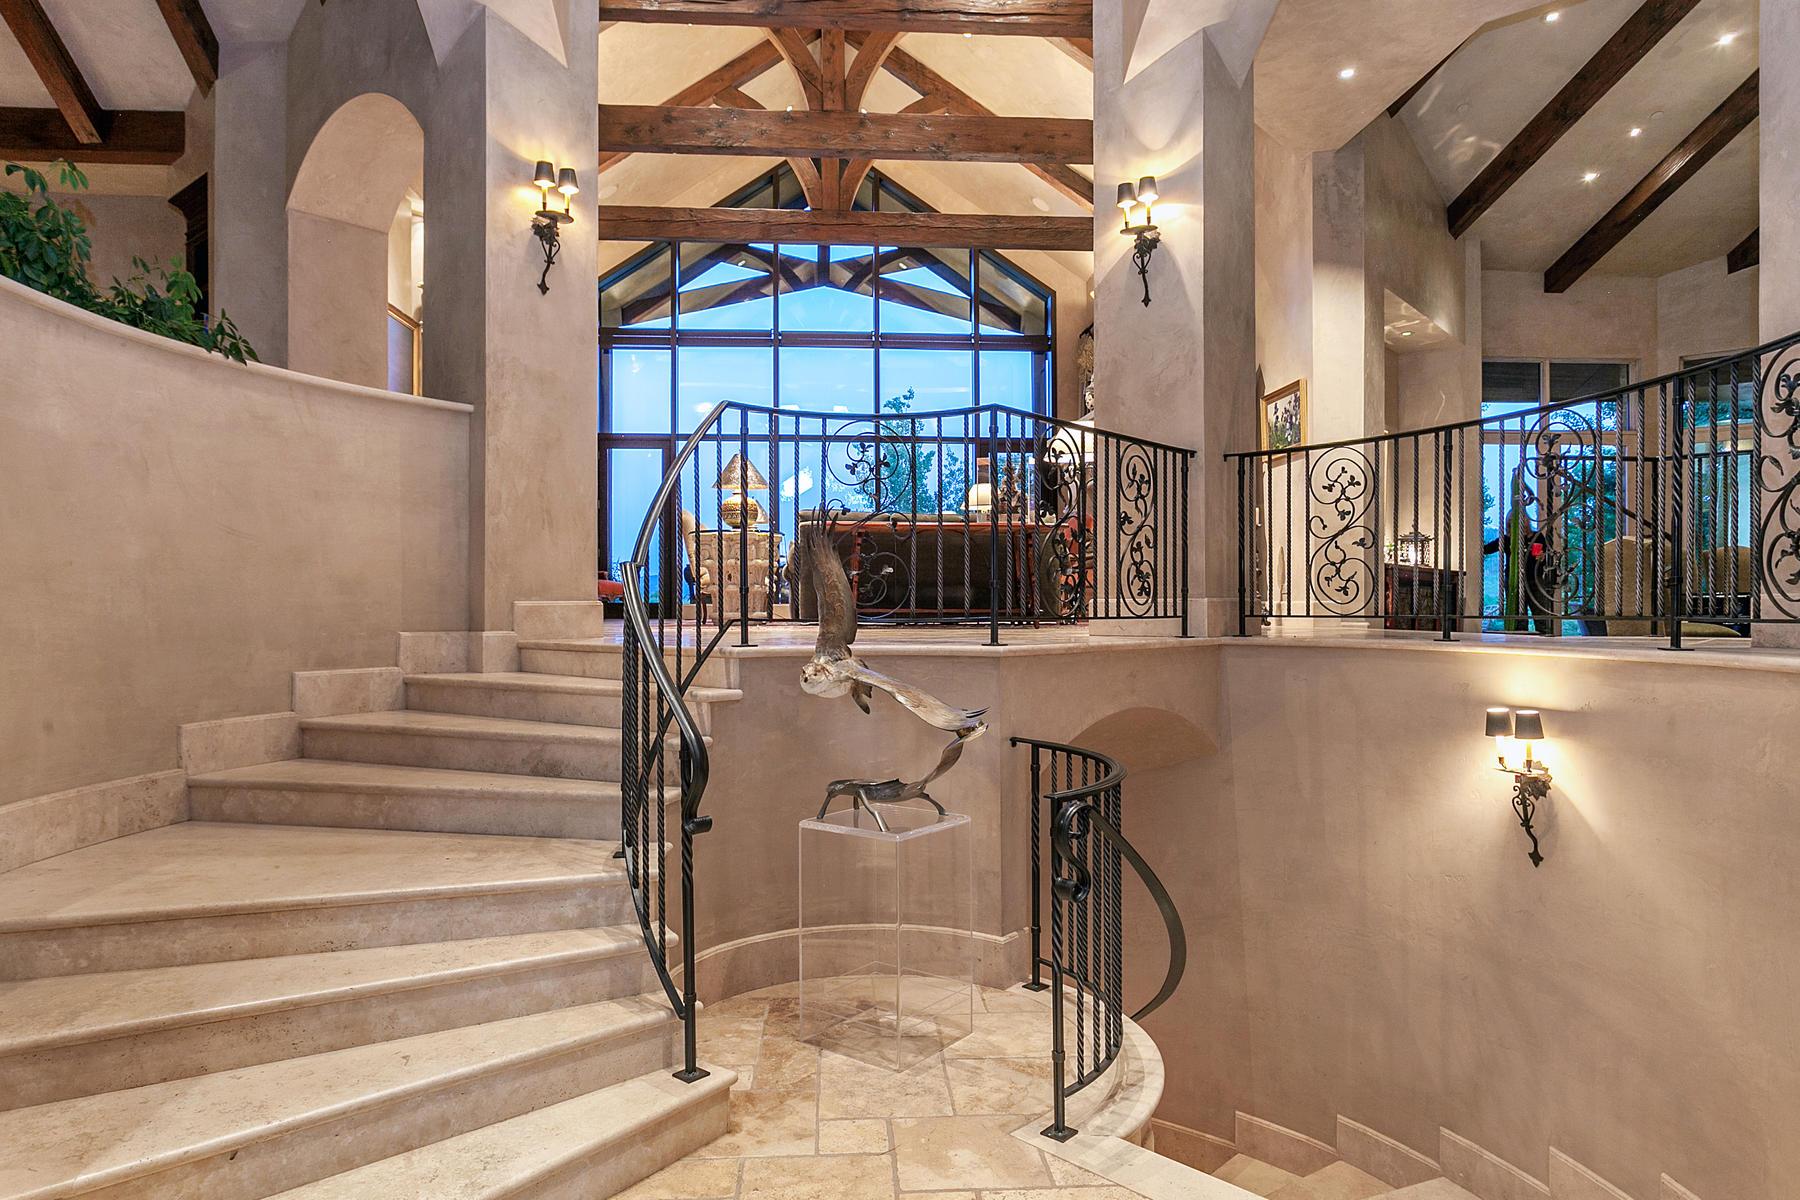 Additional photo for property listing at Elk Ridge Ranch Estate 909 Ute Forest Lane Edwards, Colorado 81632 United States